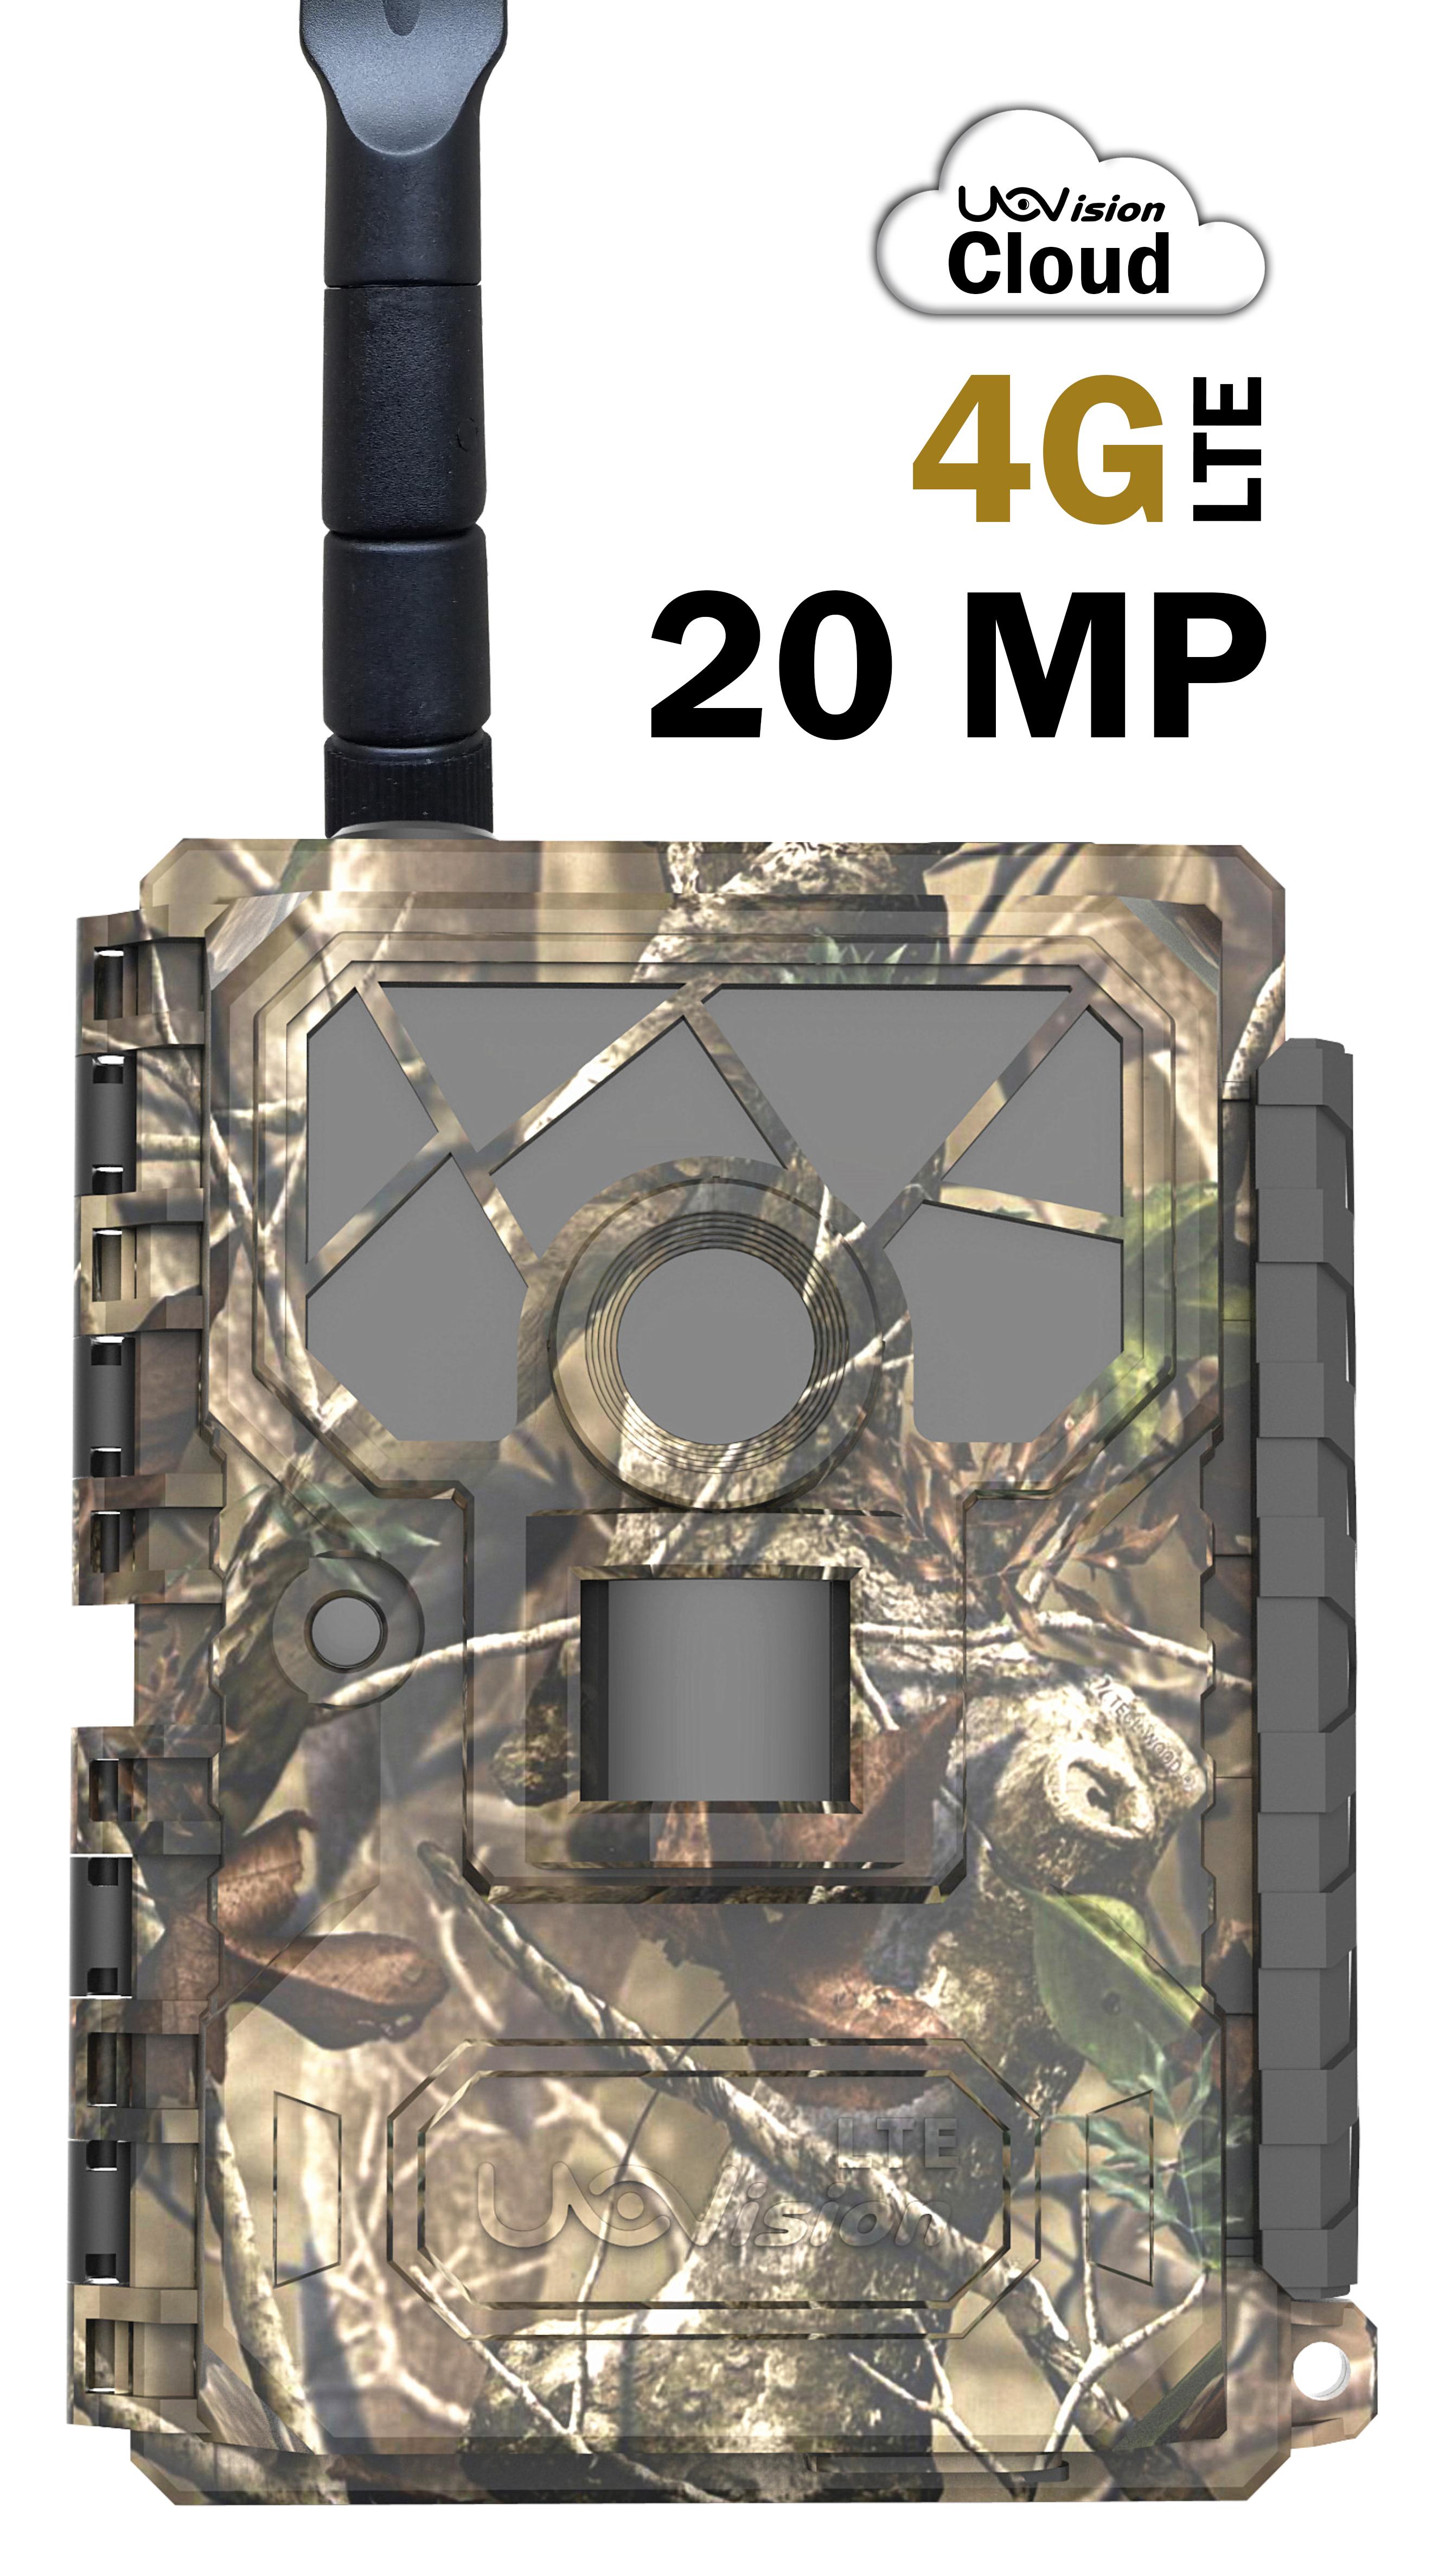 Åtelkamera UOVision Glory 4G/LTE 20mp - Cloud-App